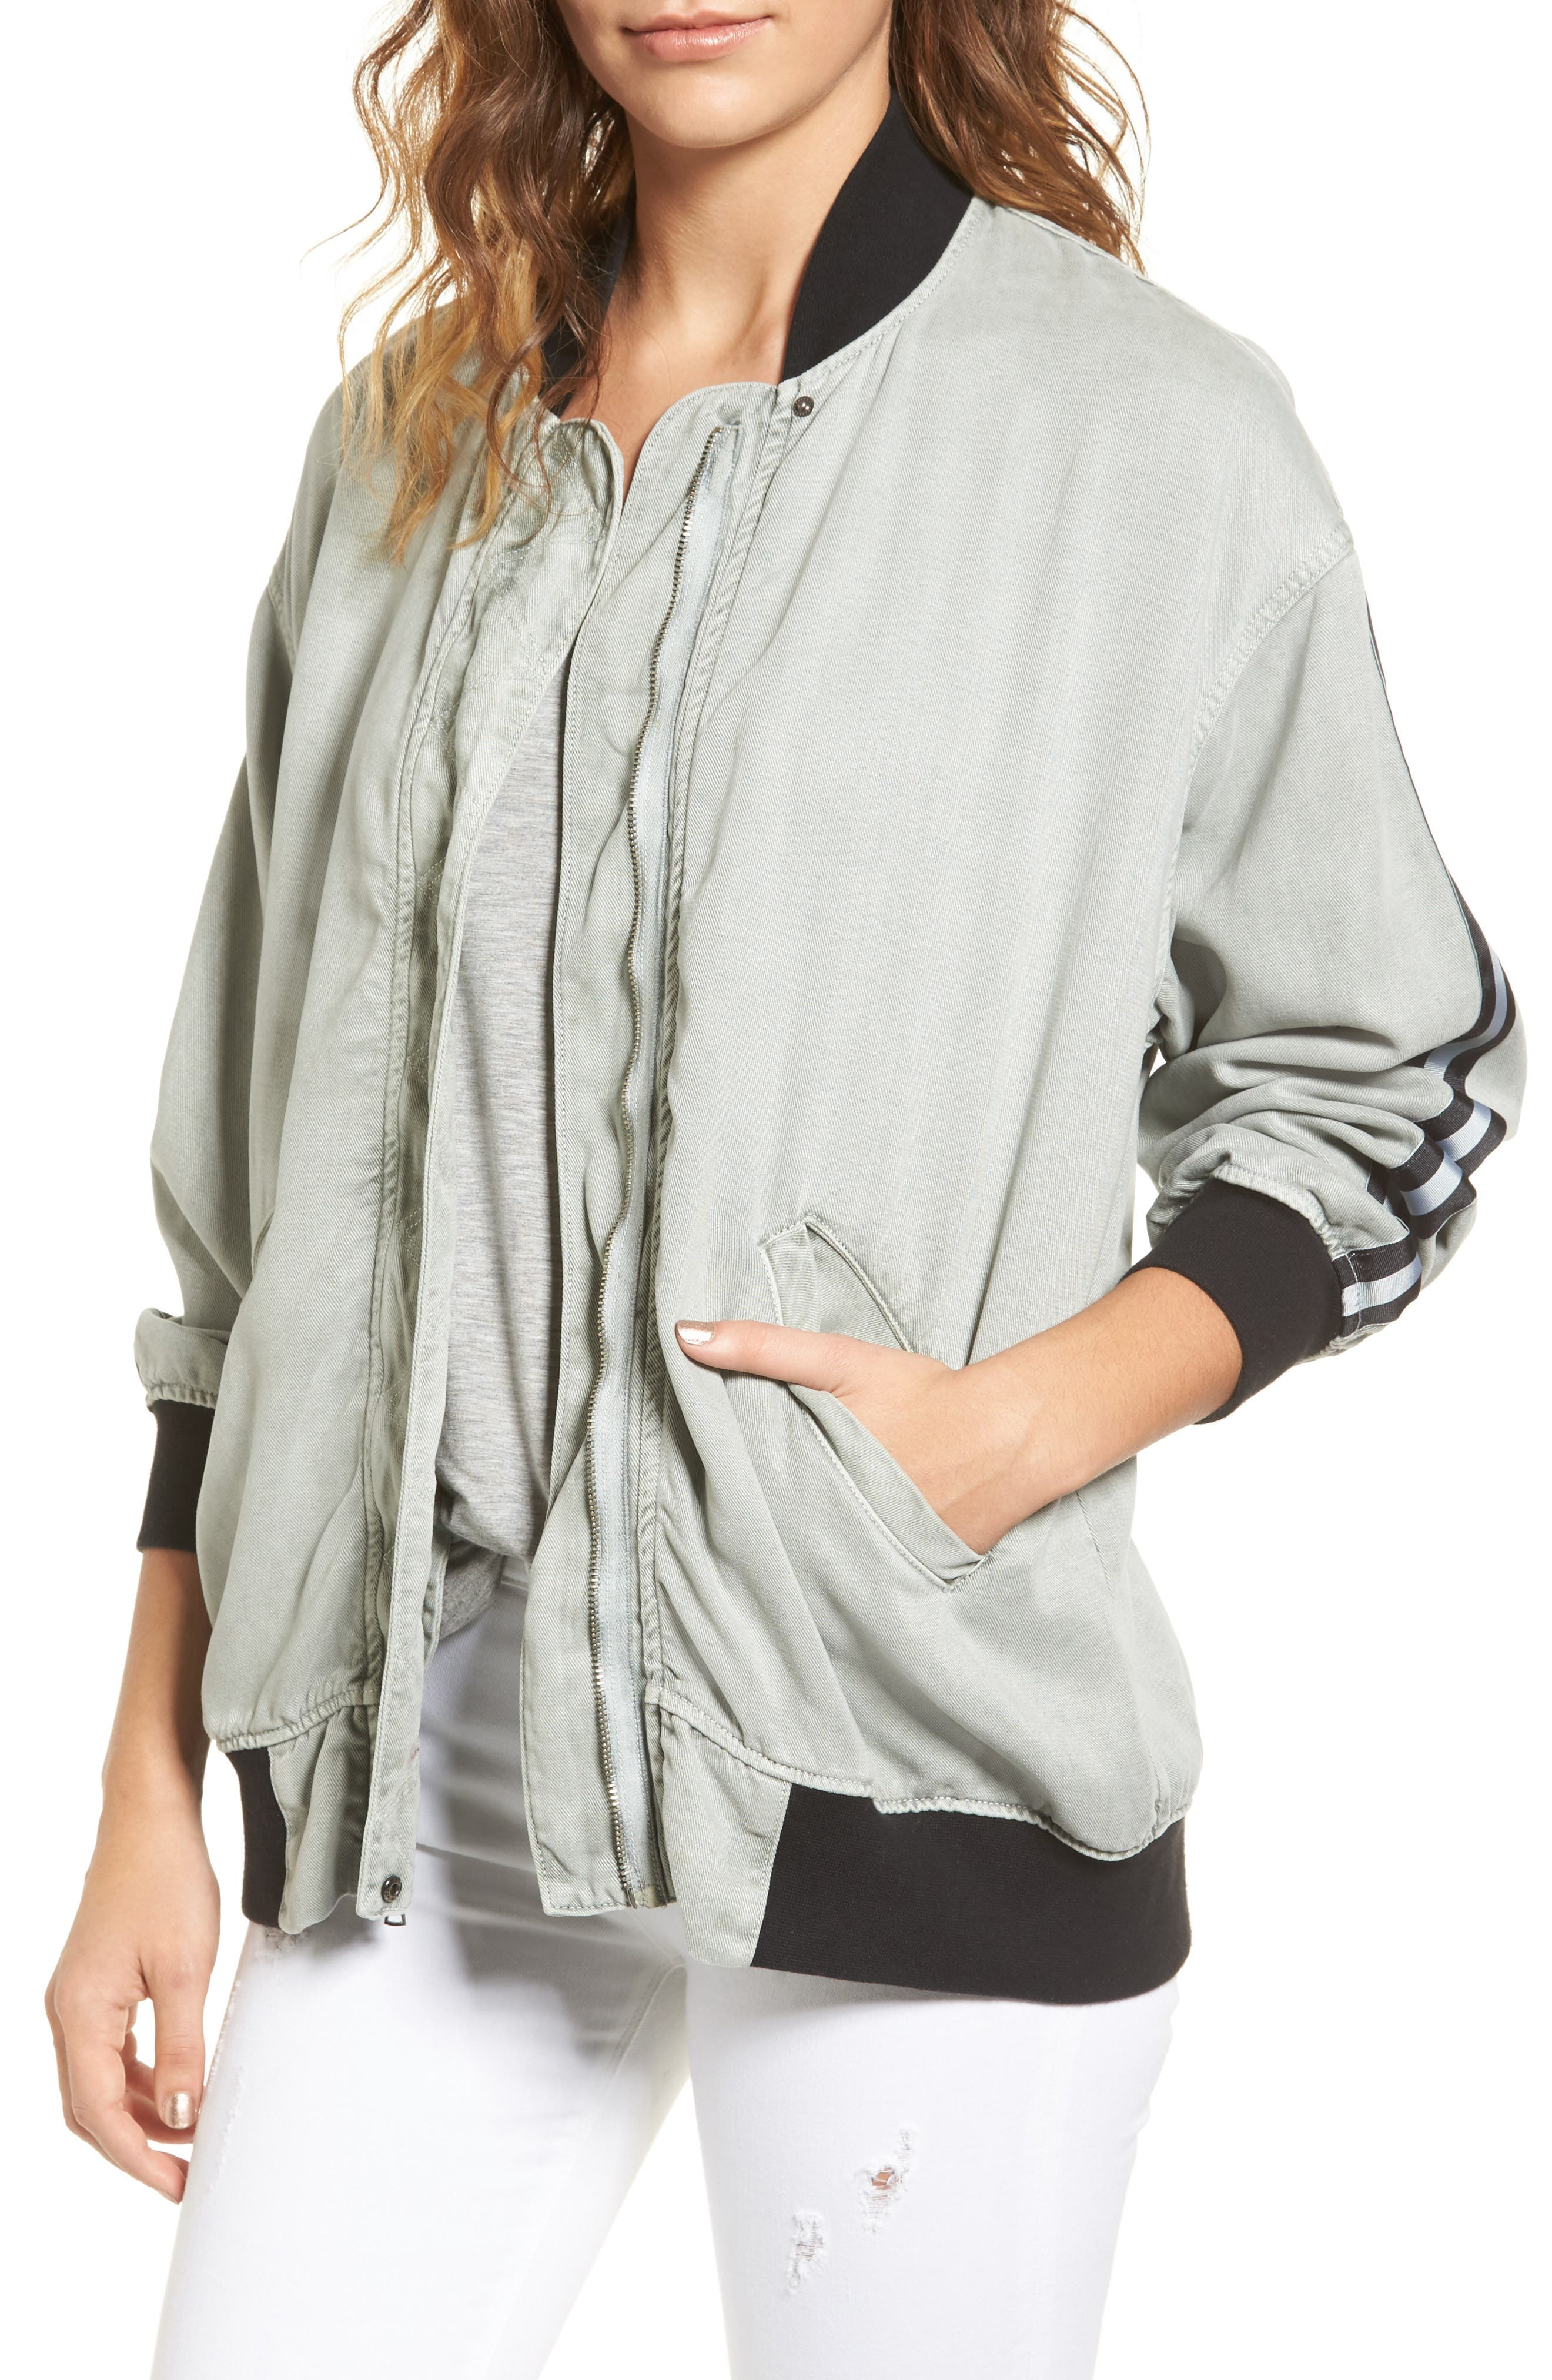 Hudson Jeans Nova Varsity Jacket